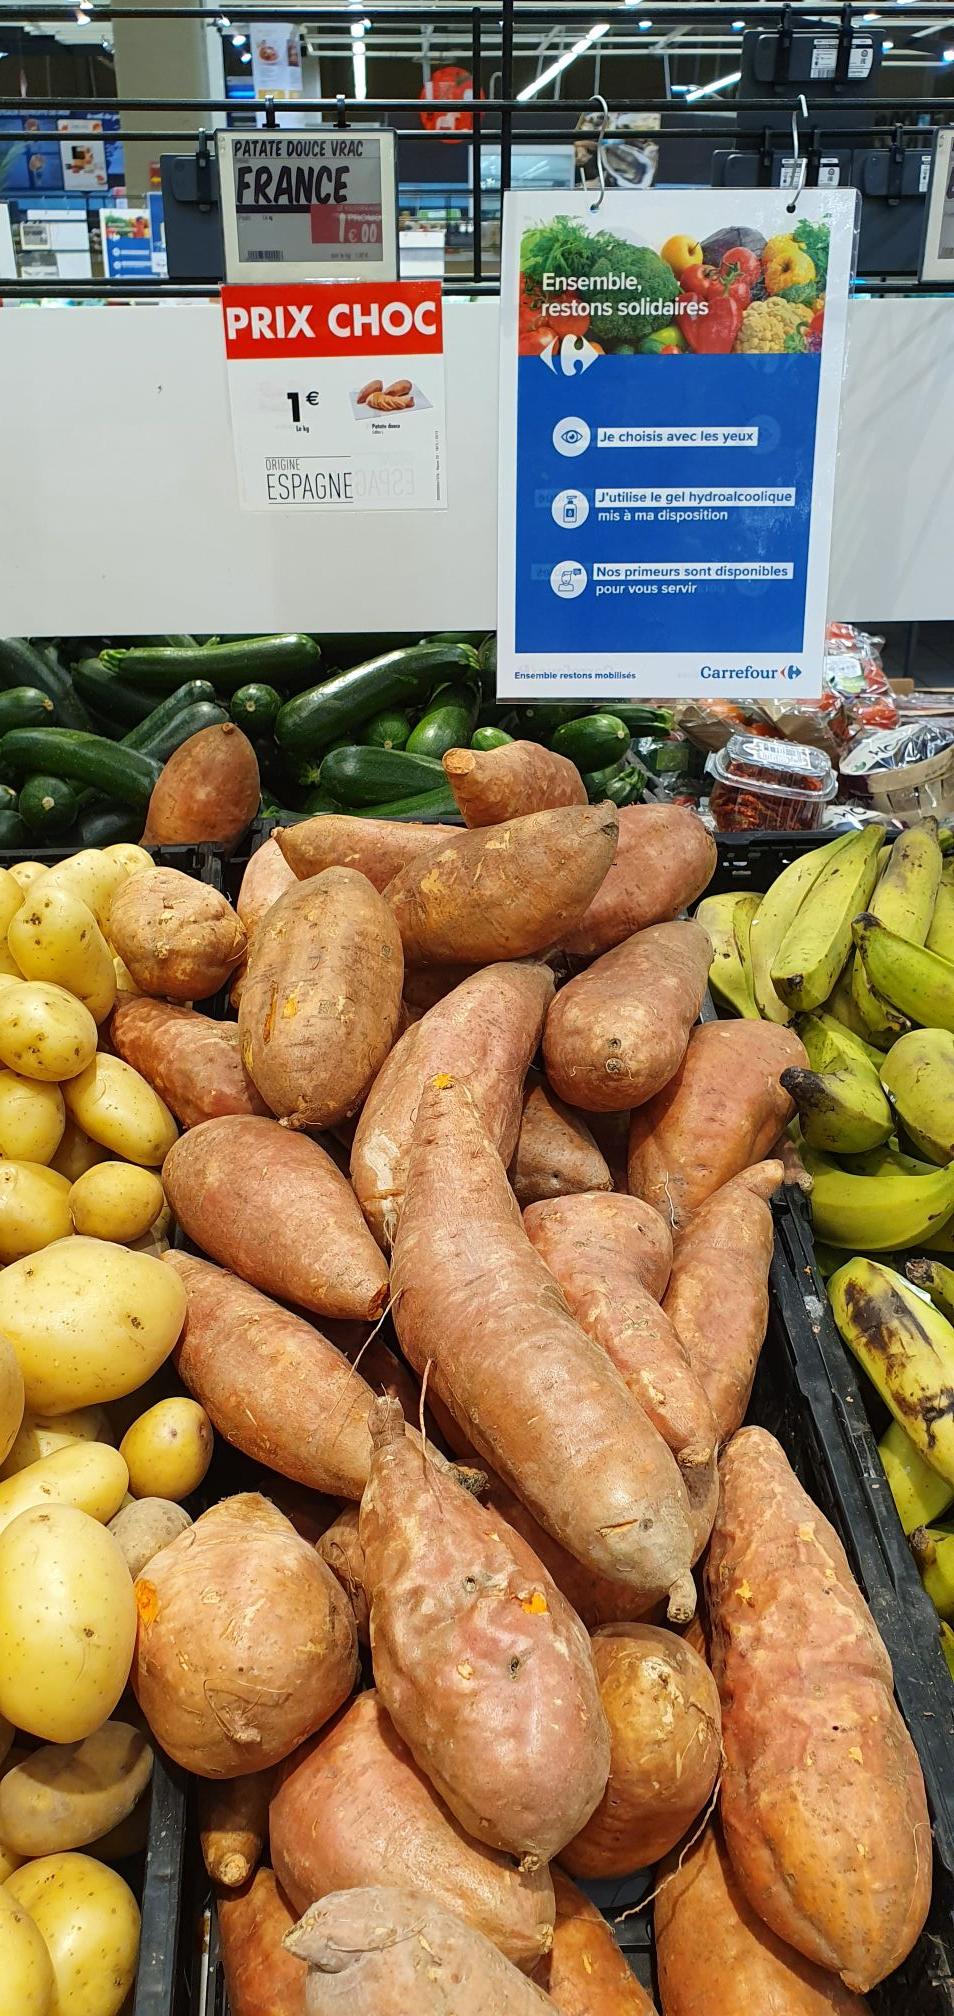 1 Kilo de Patates douce - Chamnord (73)